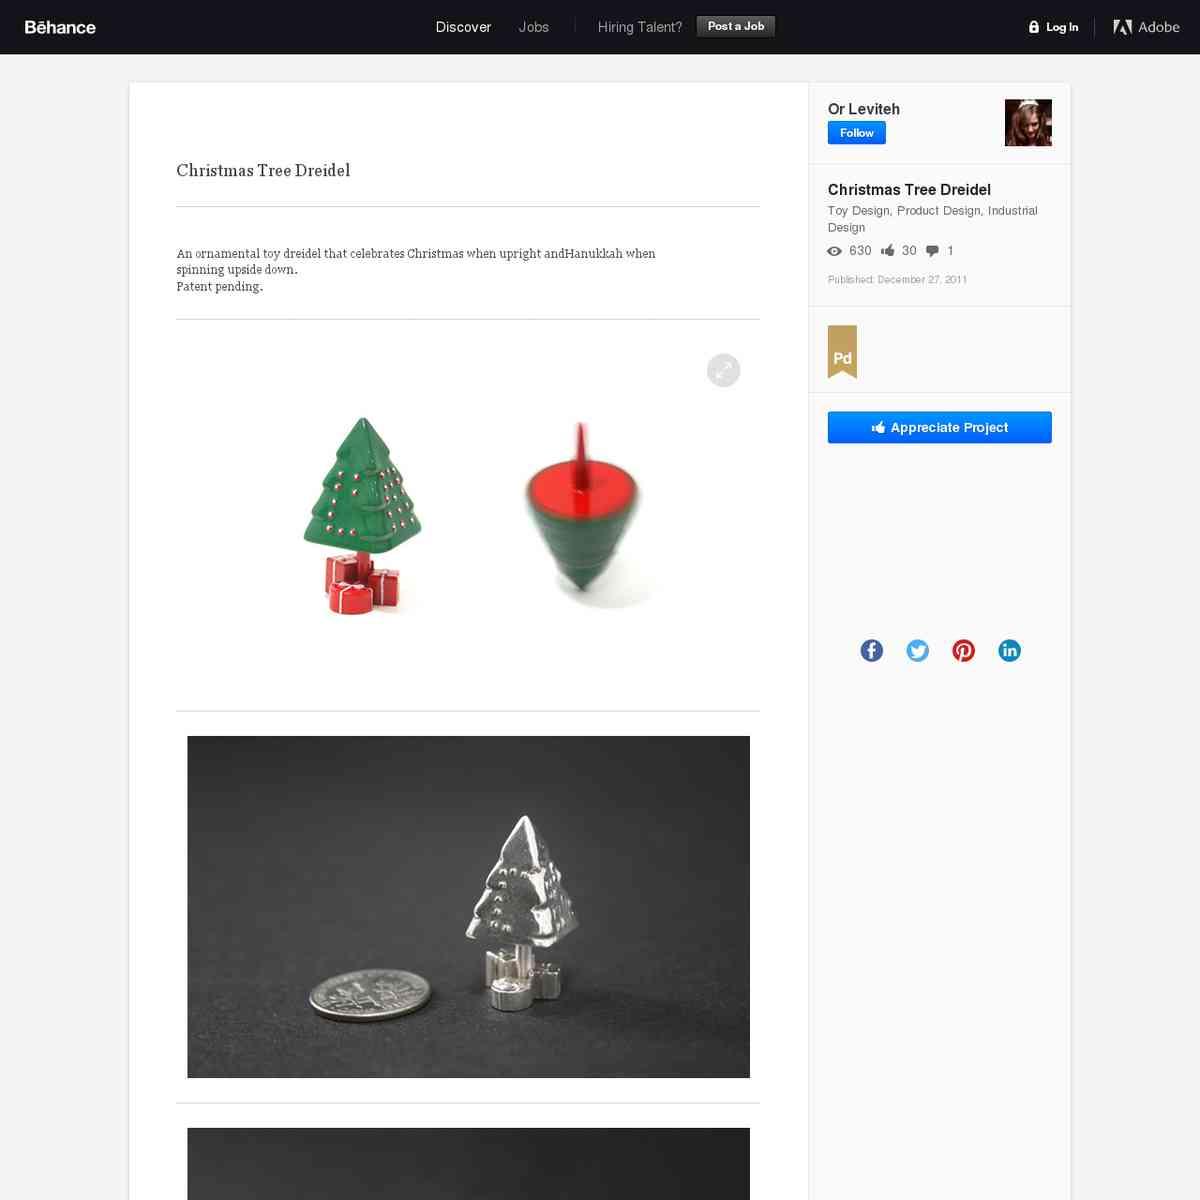 toydesignserved.com/gallery/Christmas-Tree-Dreidel/2748167